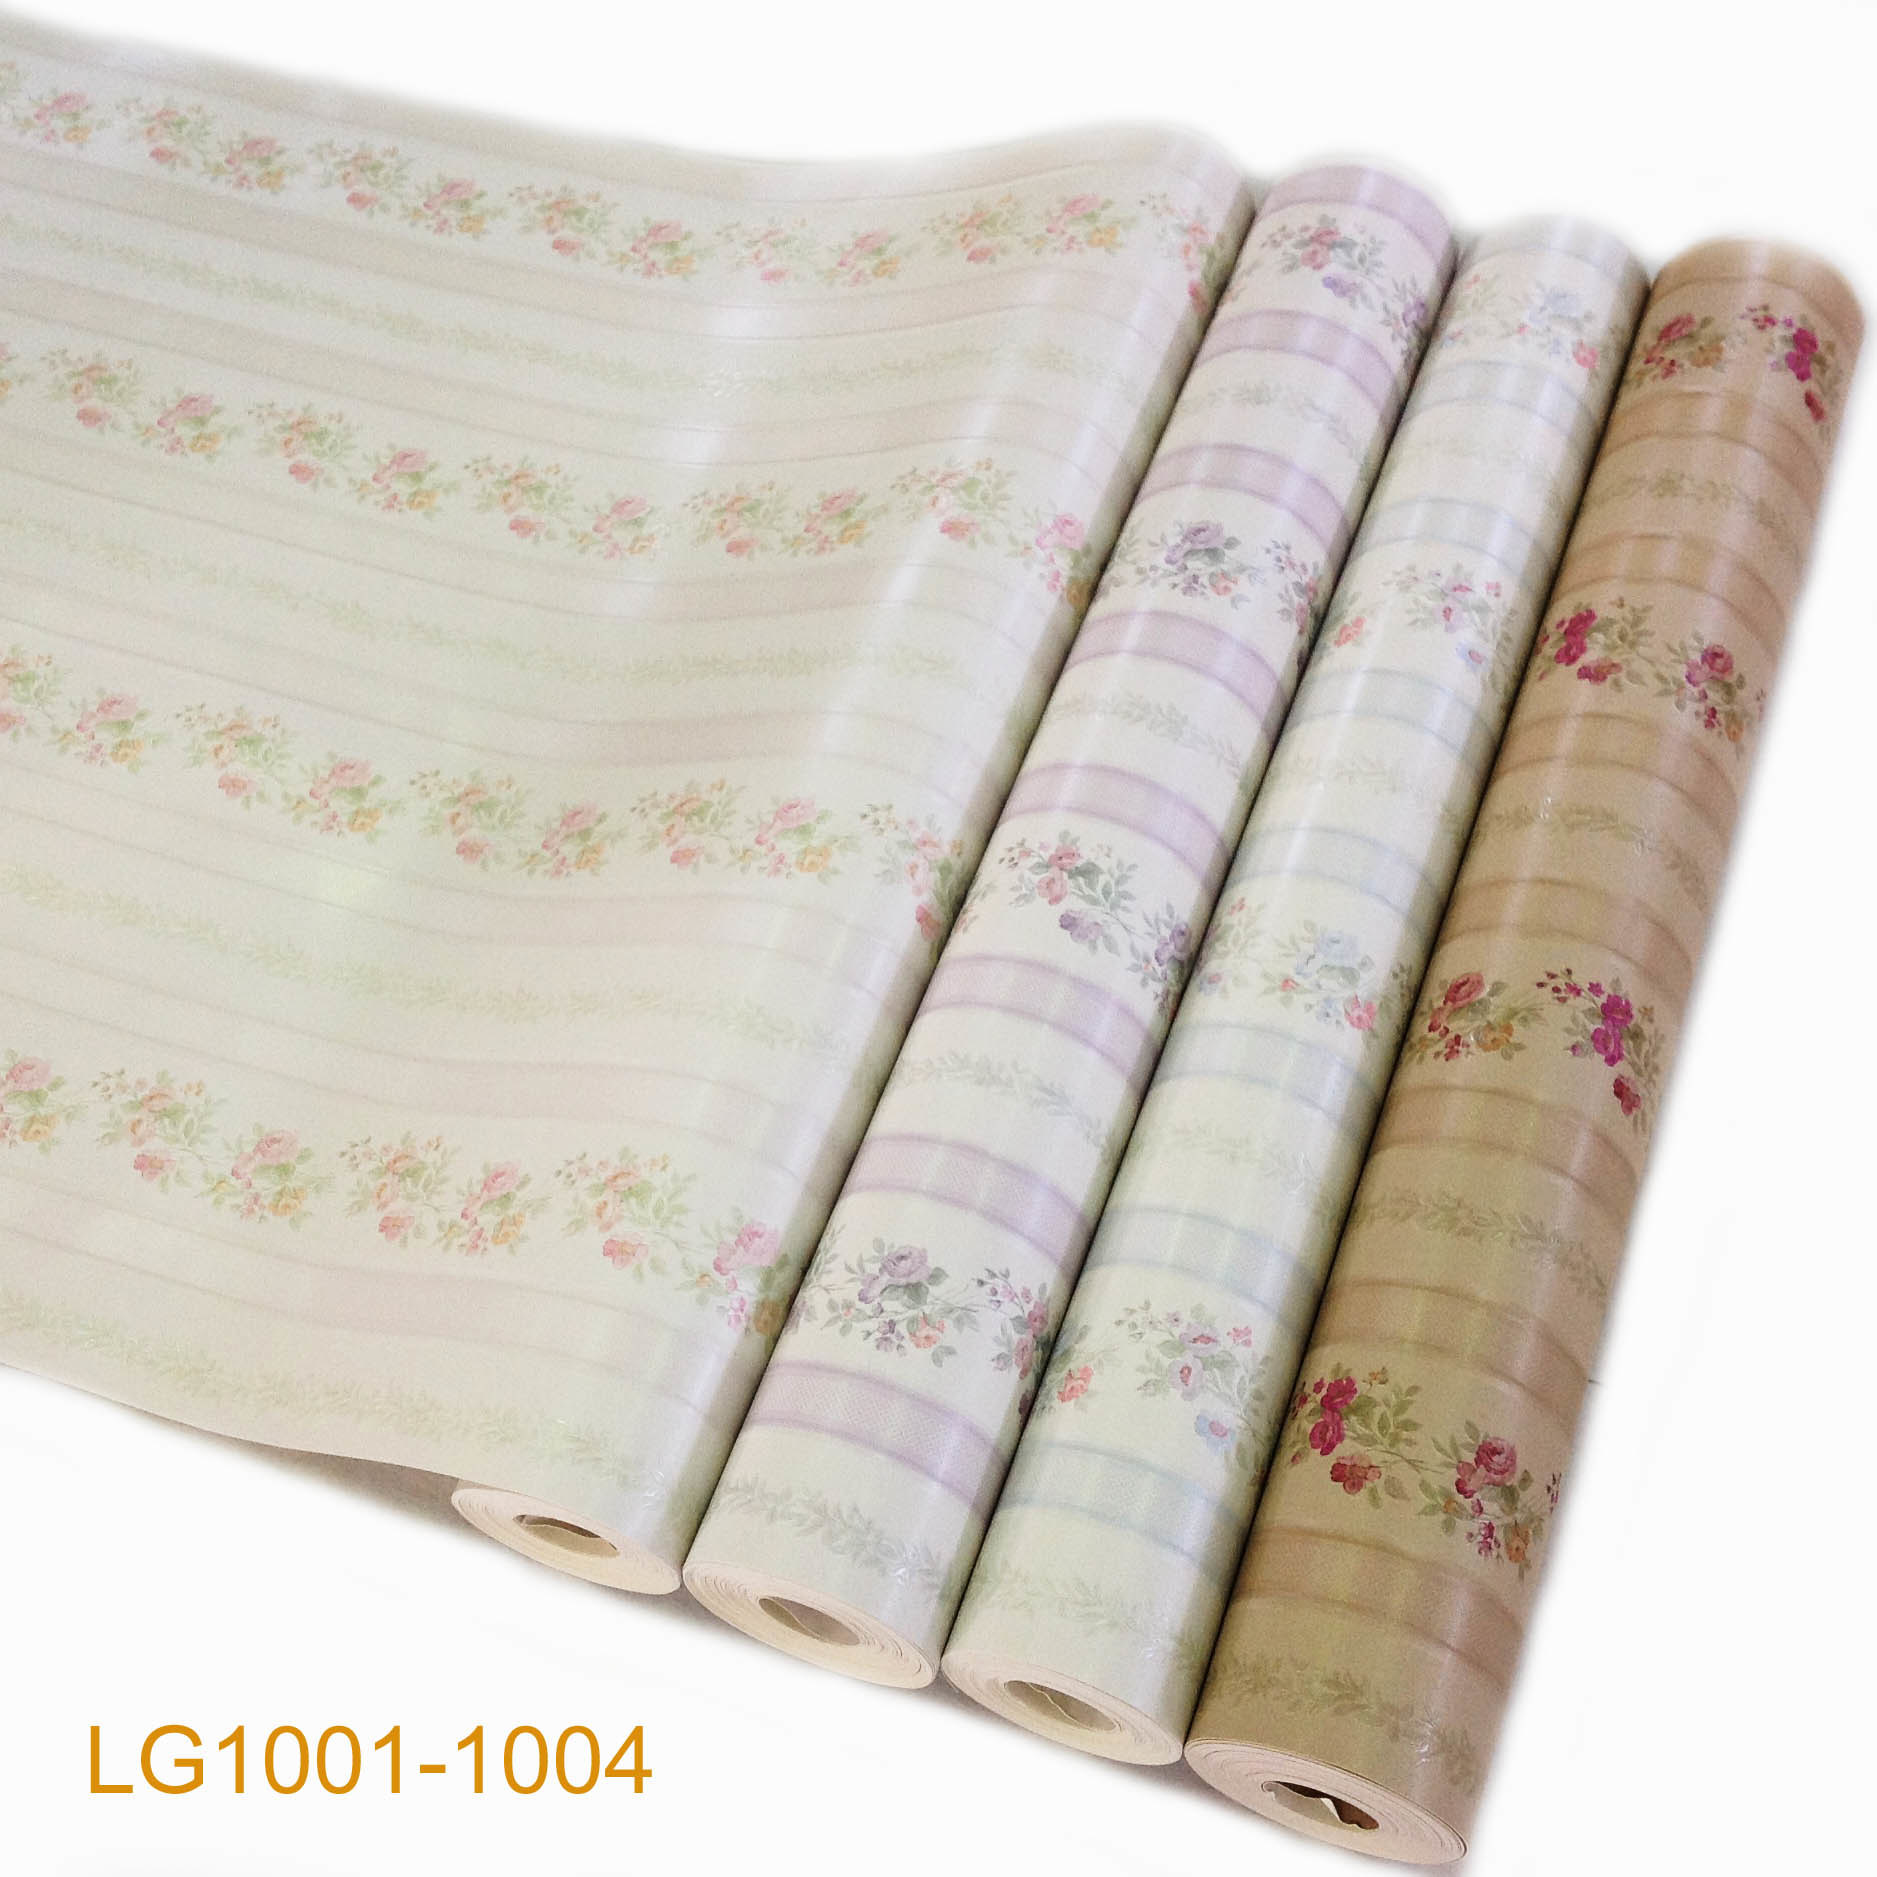 Papel pintado casero floral lavable ign fugo lg1001 1004 for Papel pared lavable